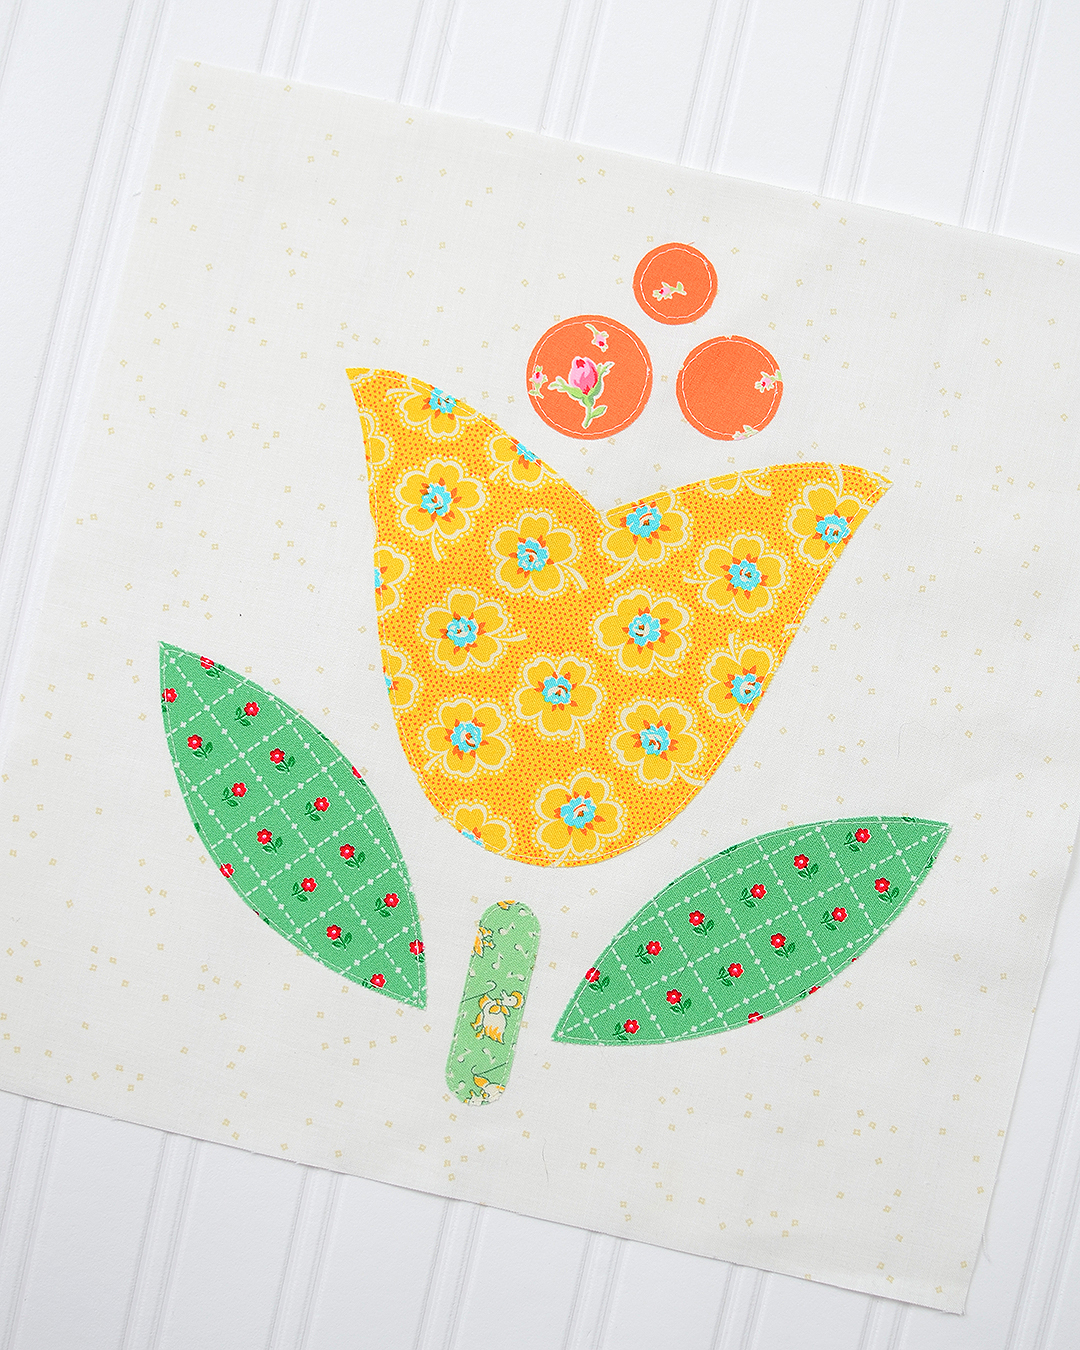 Tulip appliqué - interfacing appliqué technique